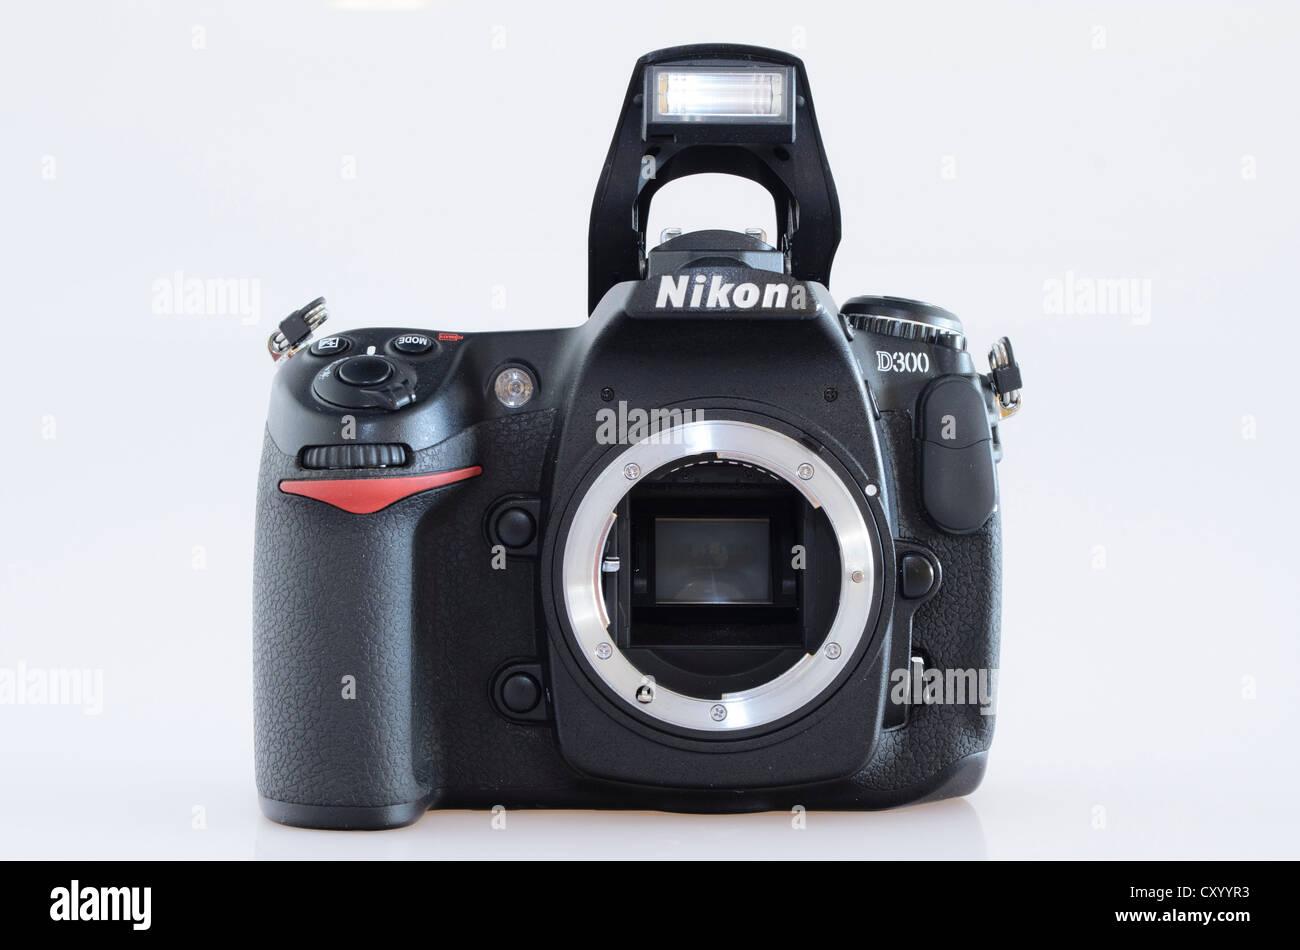 Digital SLR camera, Nikon D300 - Stock Image